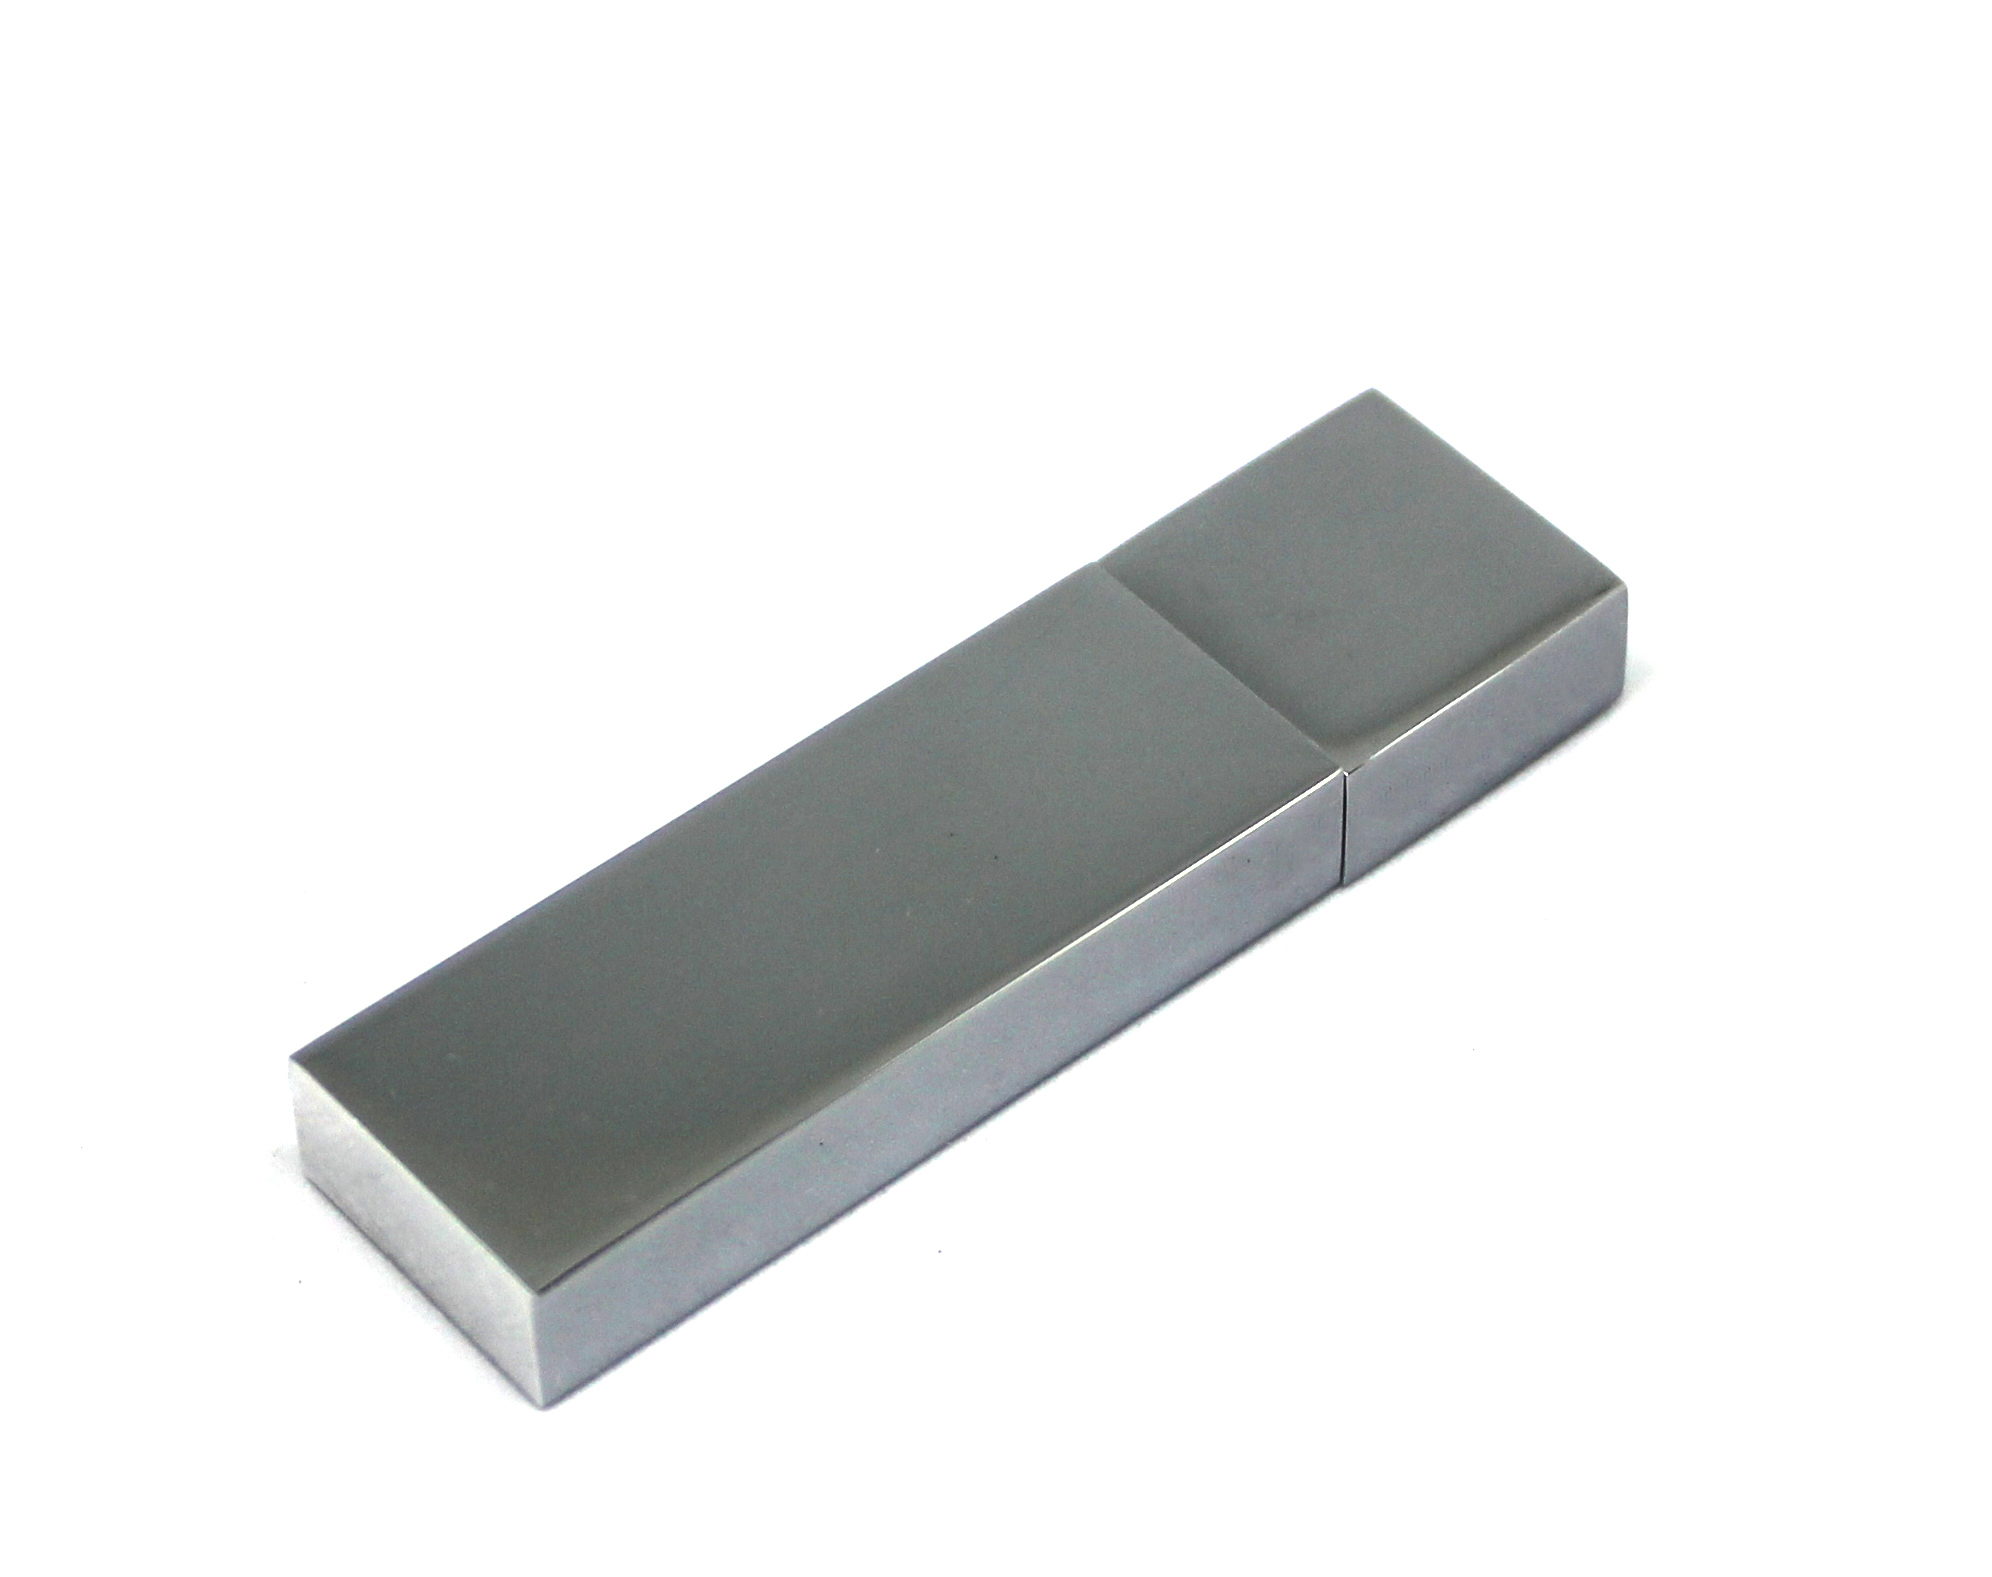 usb-флешка брусок кирпич серебро оптом